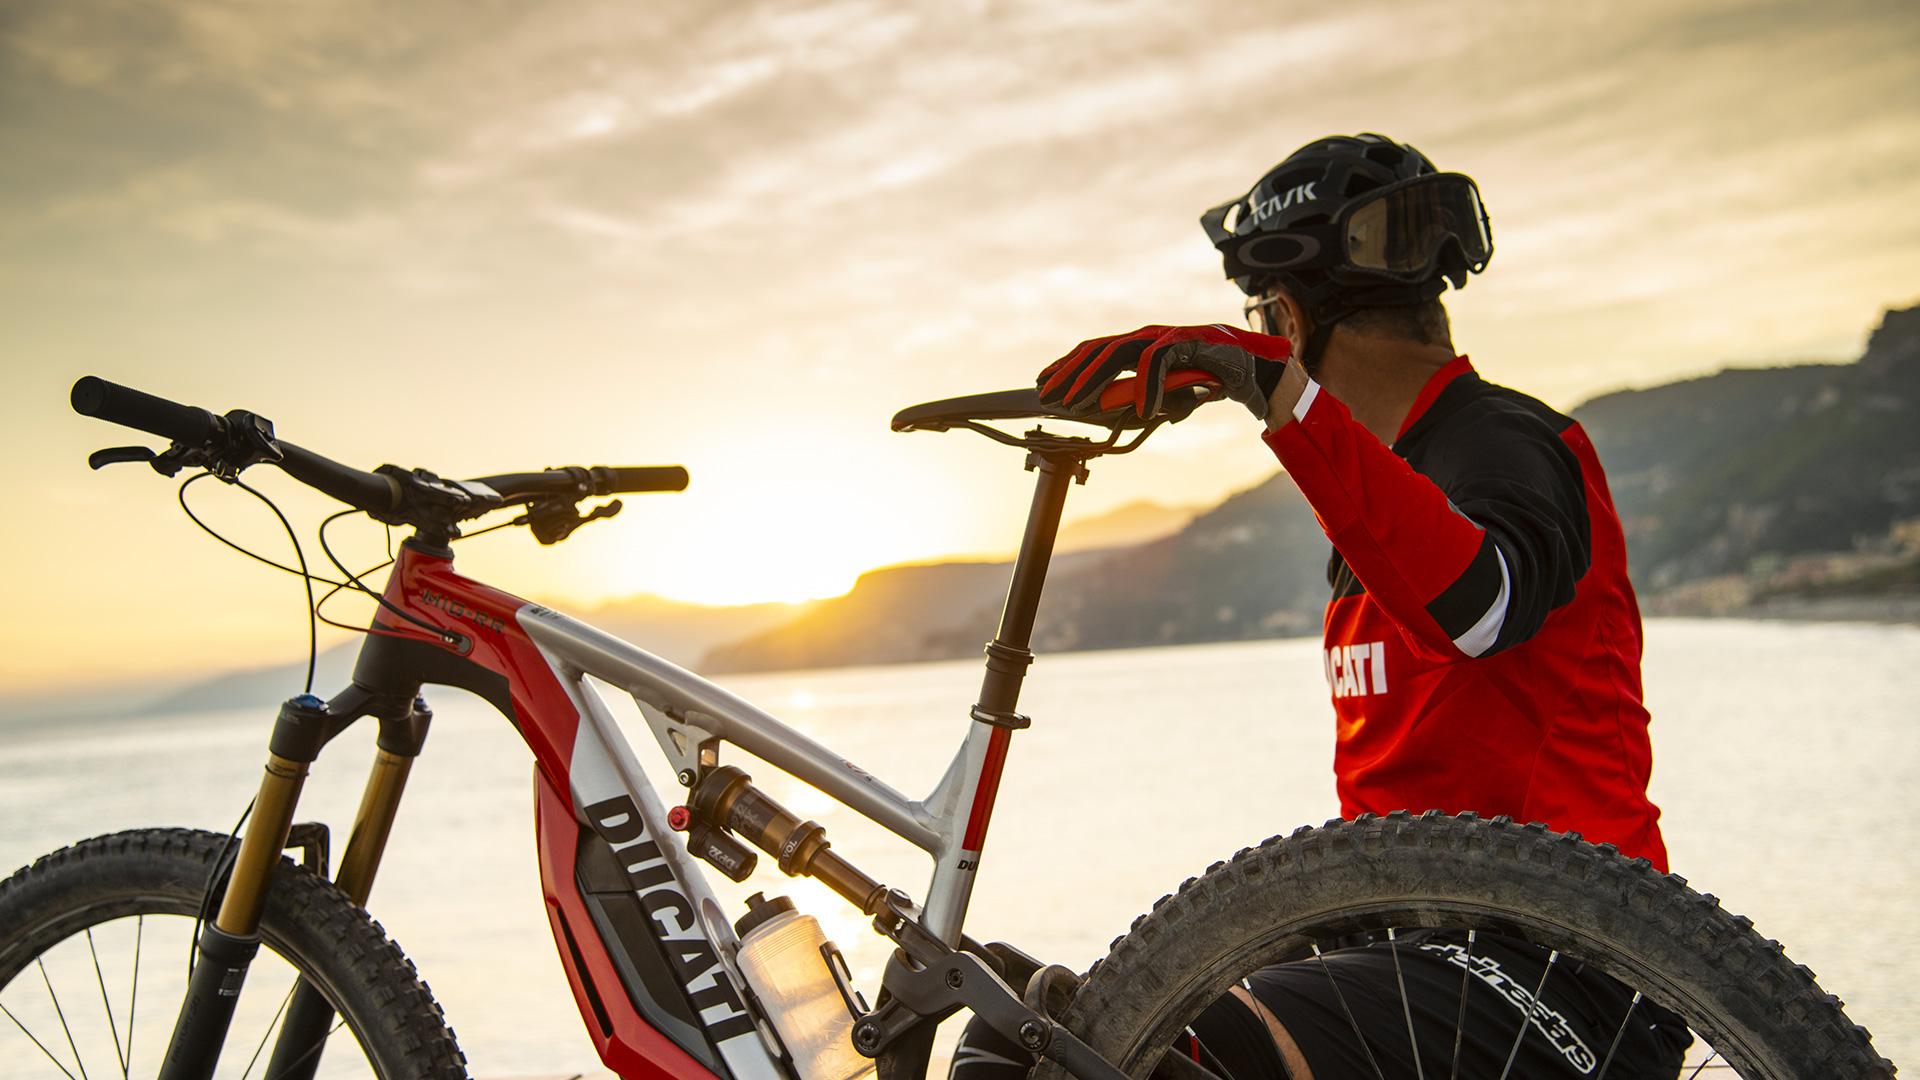 elektrische fiets, elektrische mountainbike, e-bike, ducati mig-rr